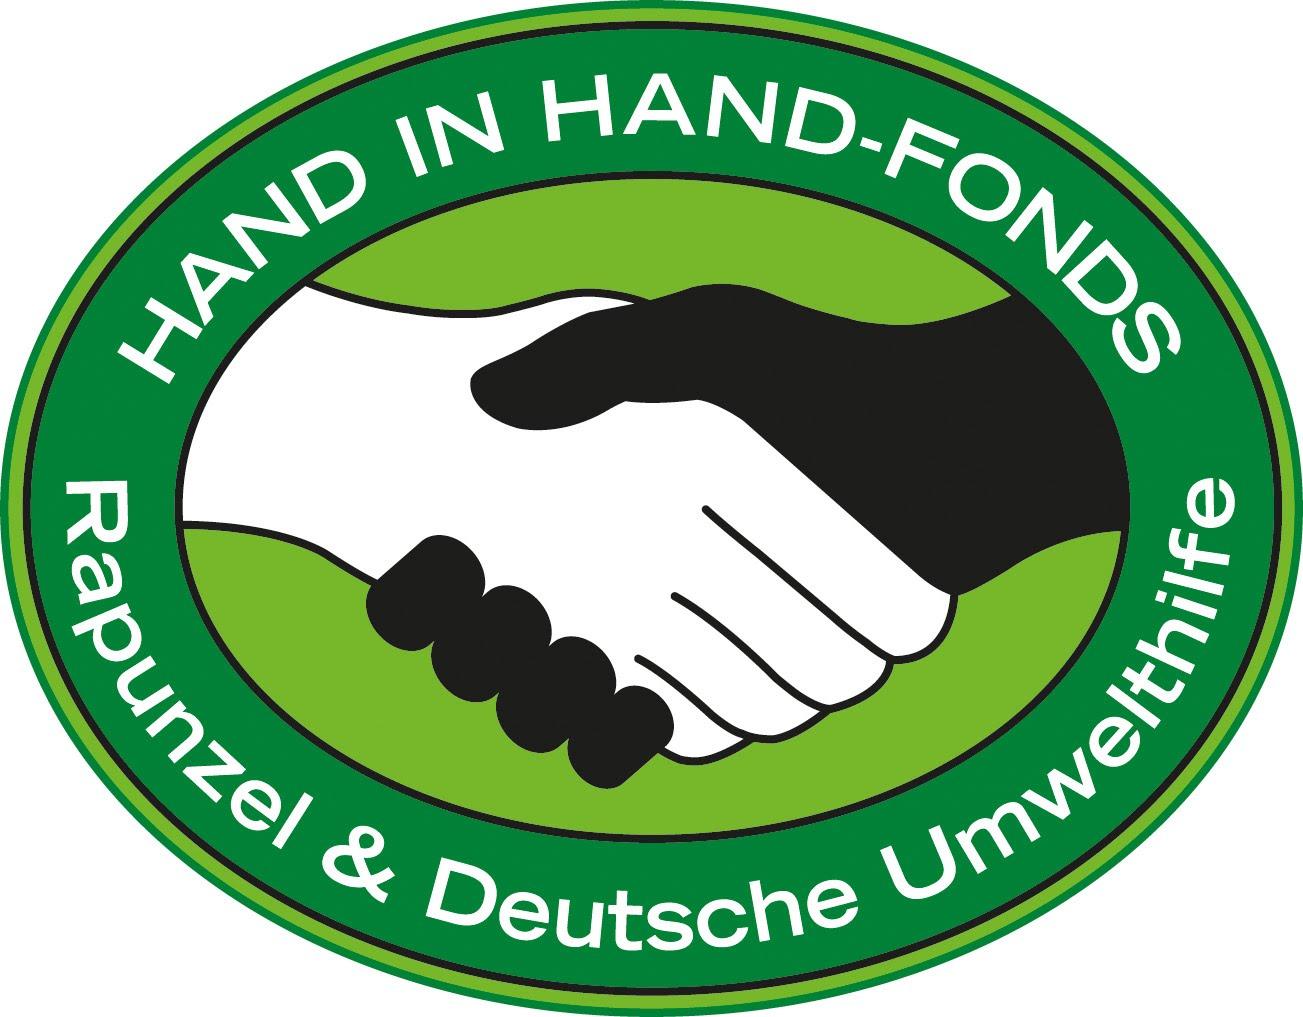 https://www.rapunzel.de/hand-in-hand-fonds.html